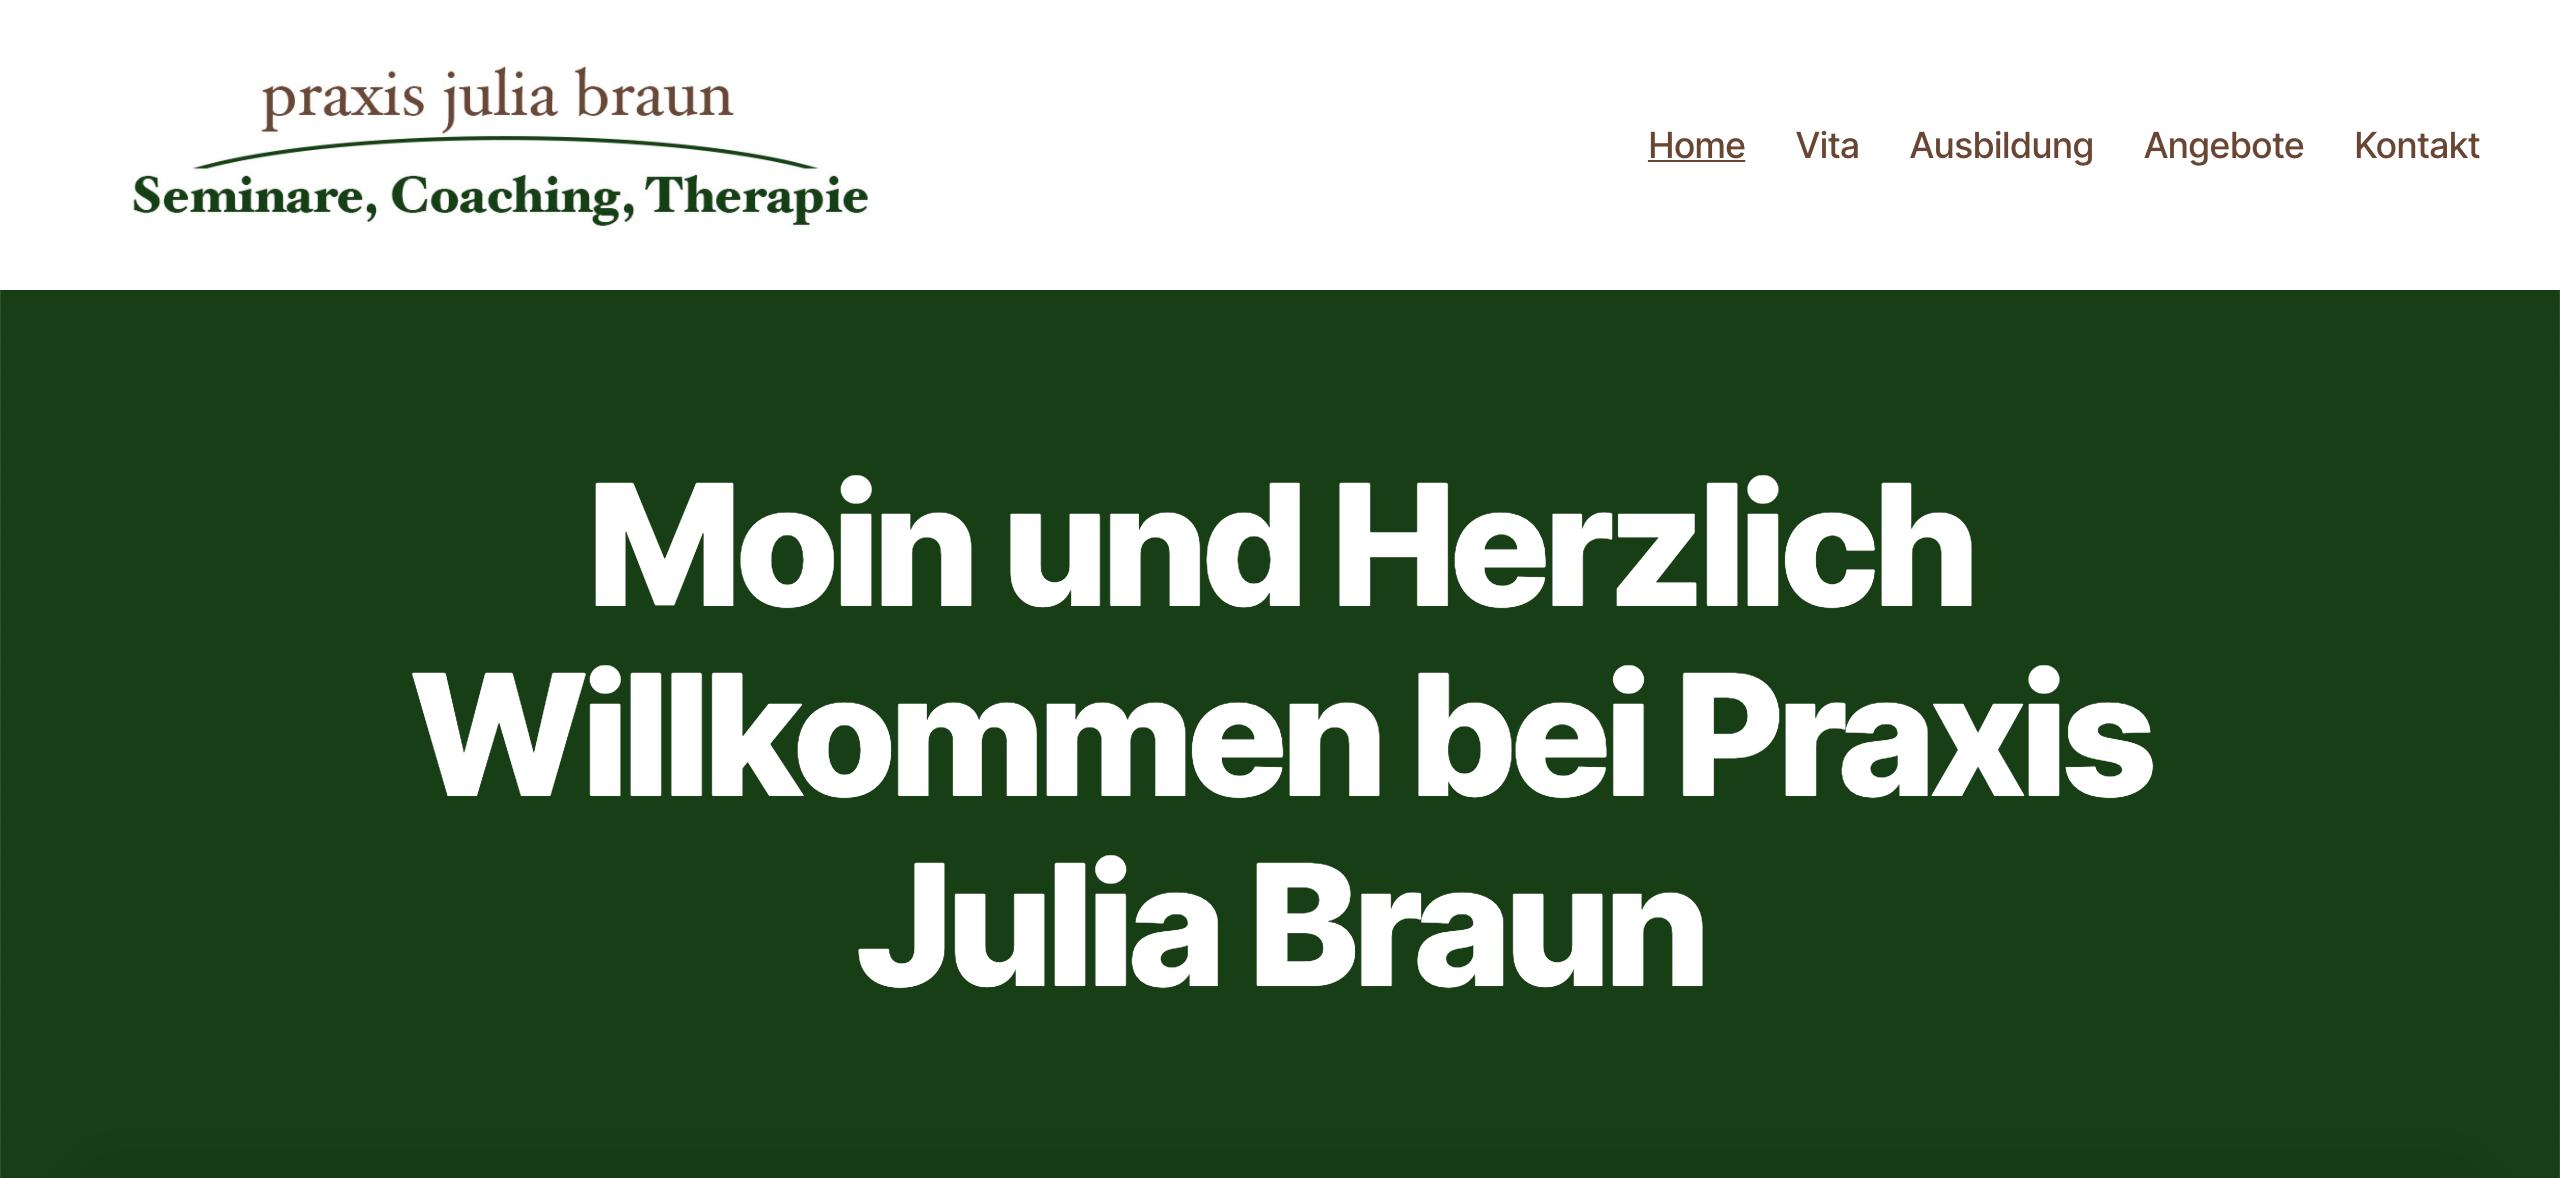 Praxis-julia-braun.de